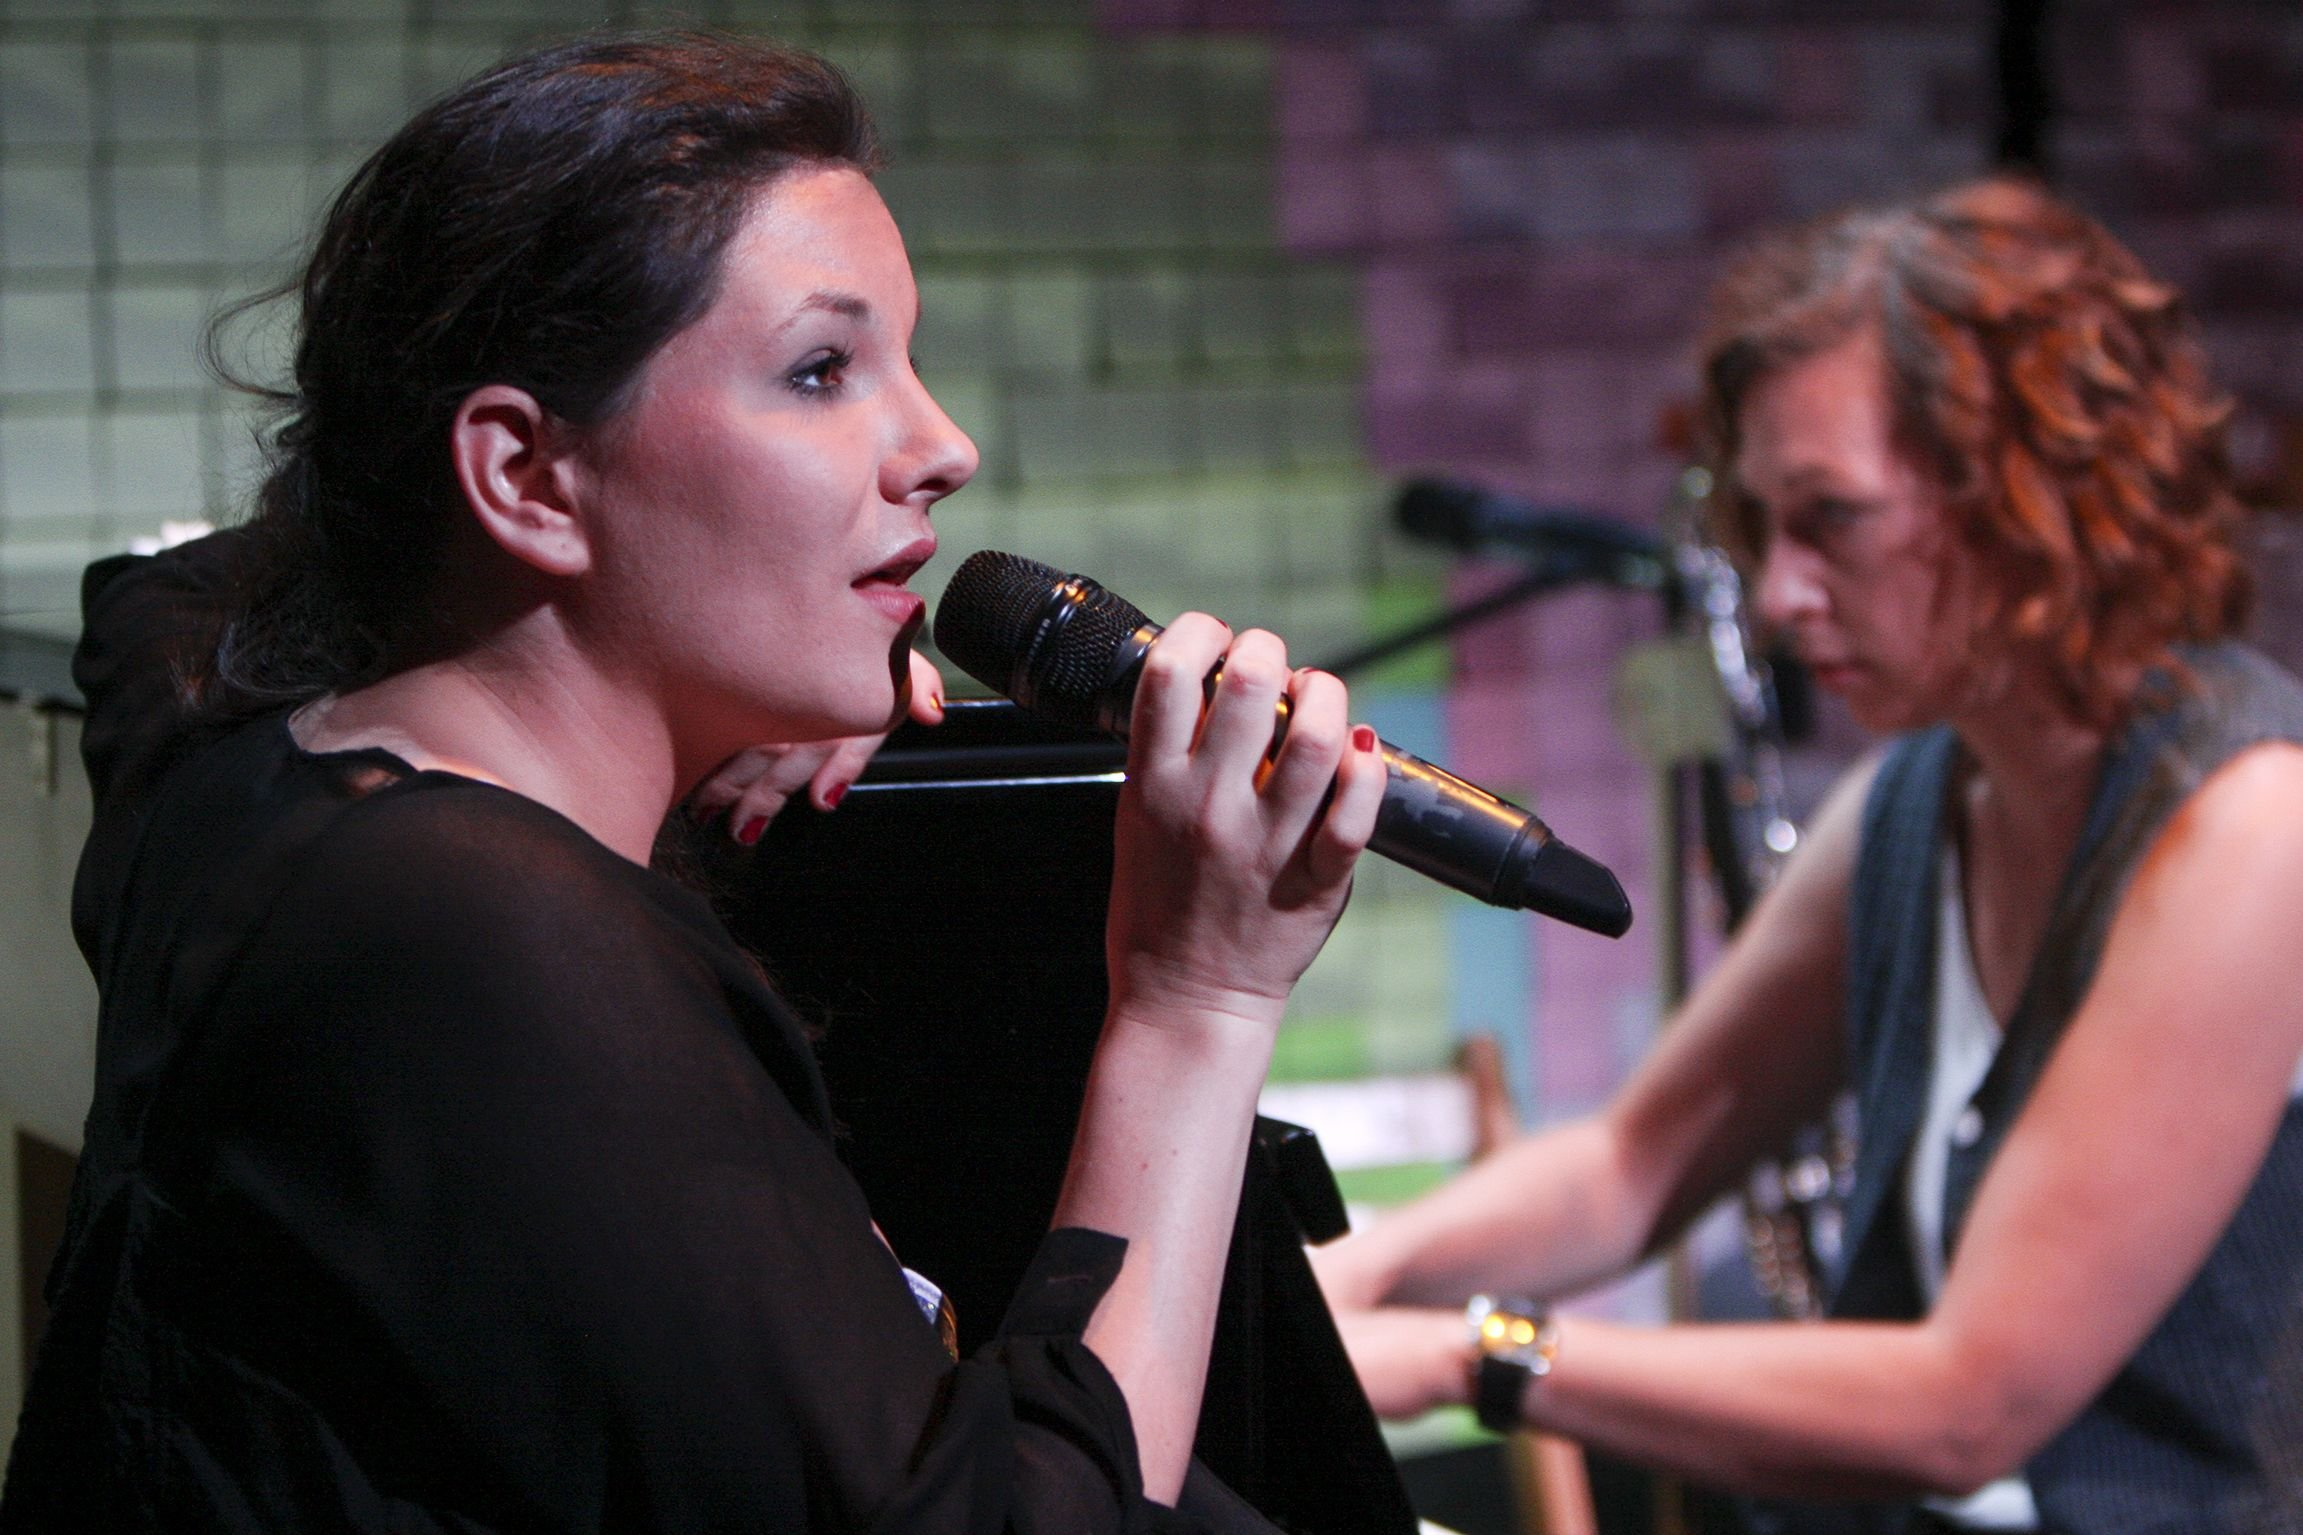 Josephine Köhler & Bettina Ostermeier: Ich will alles